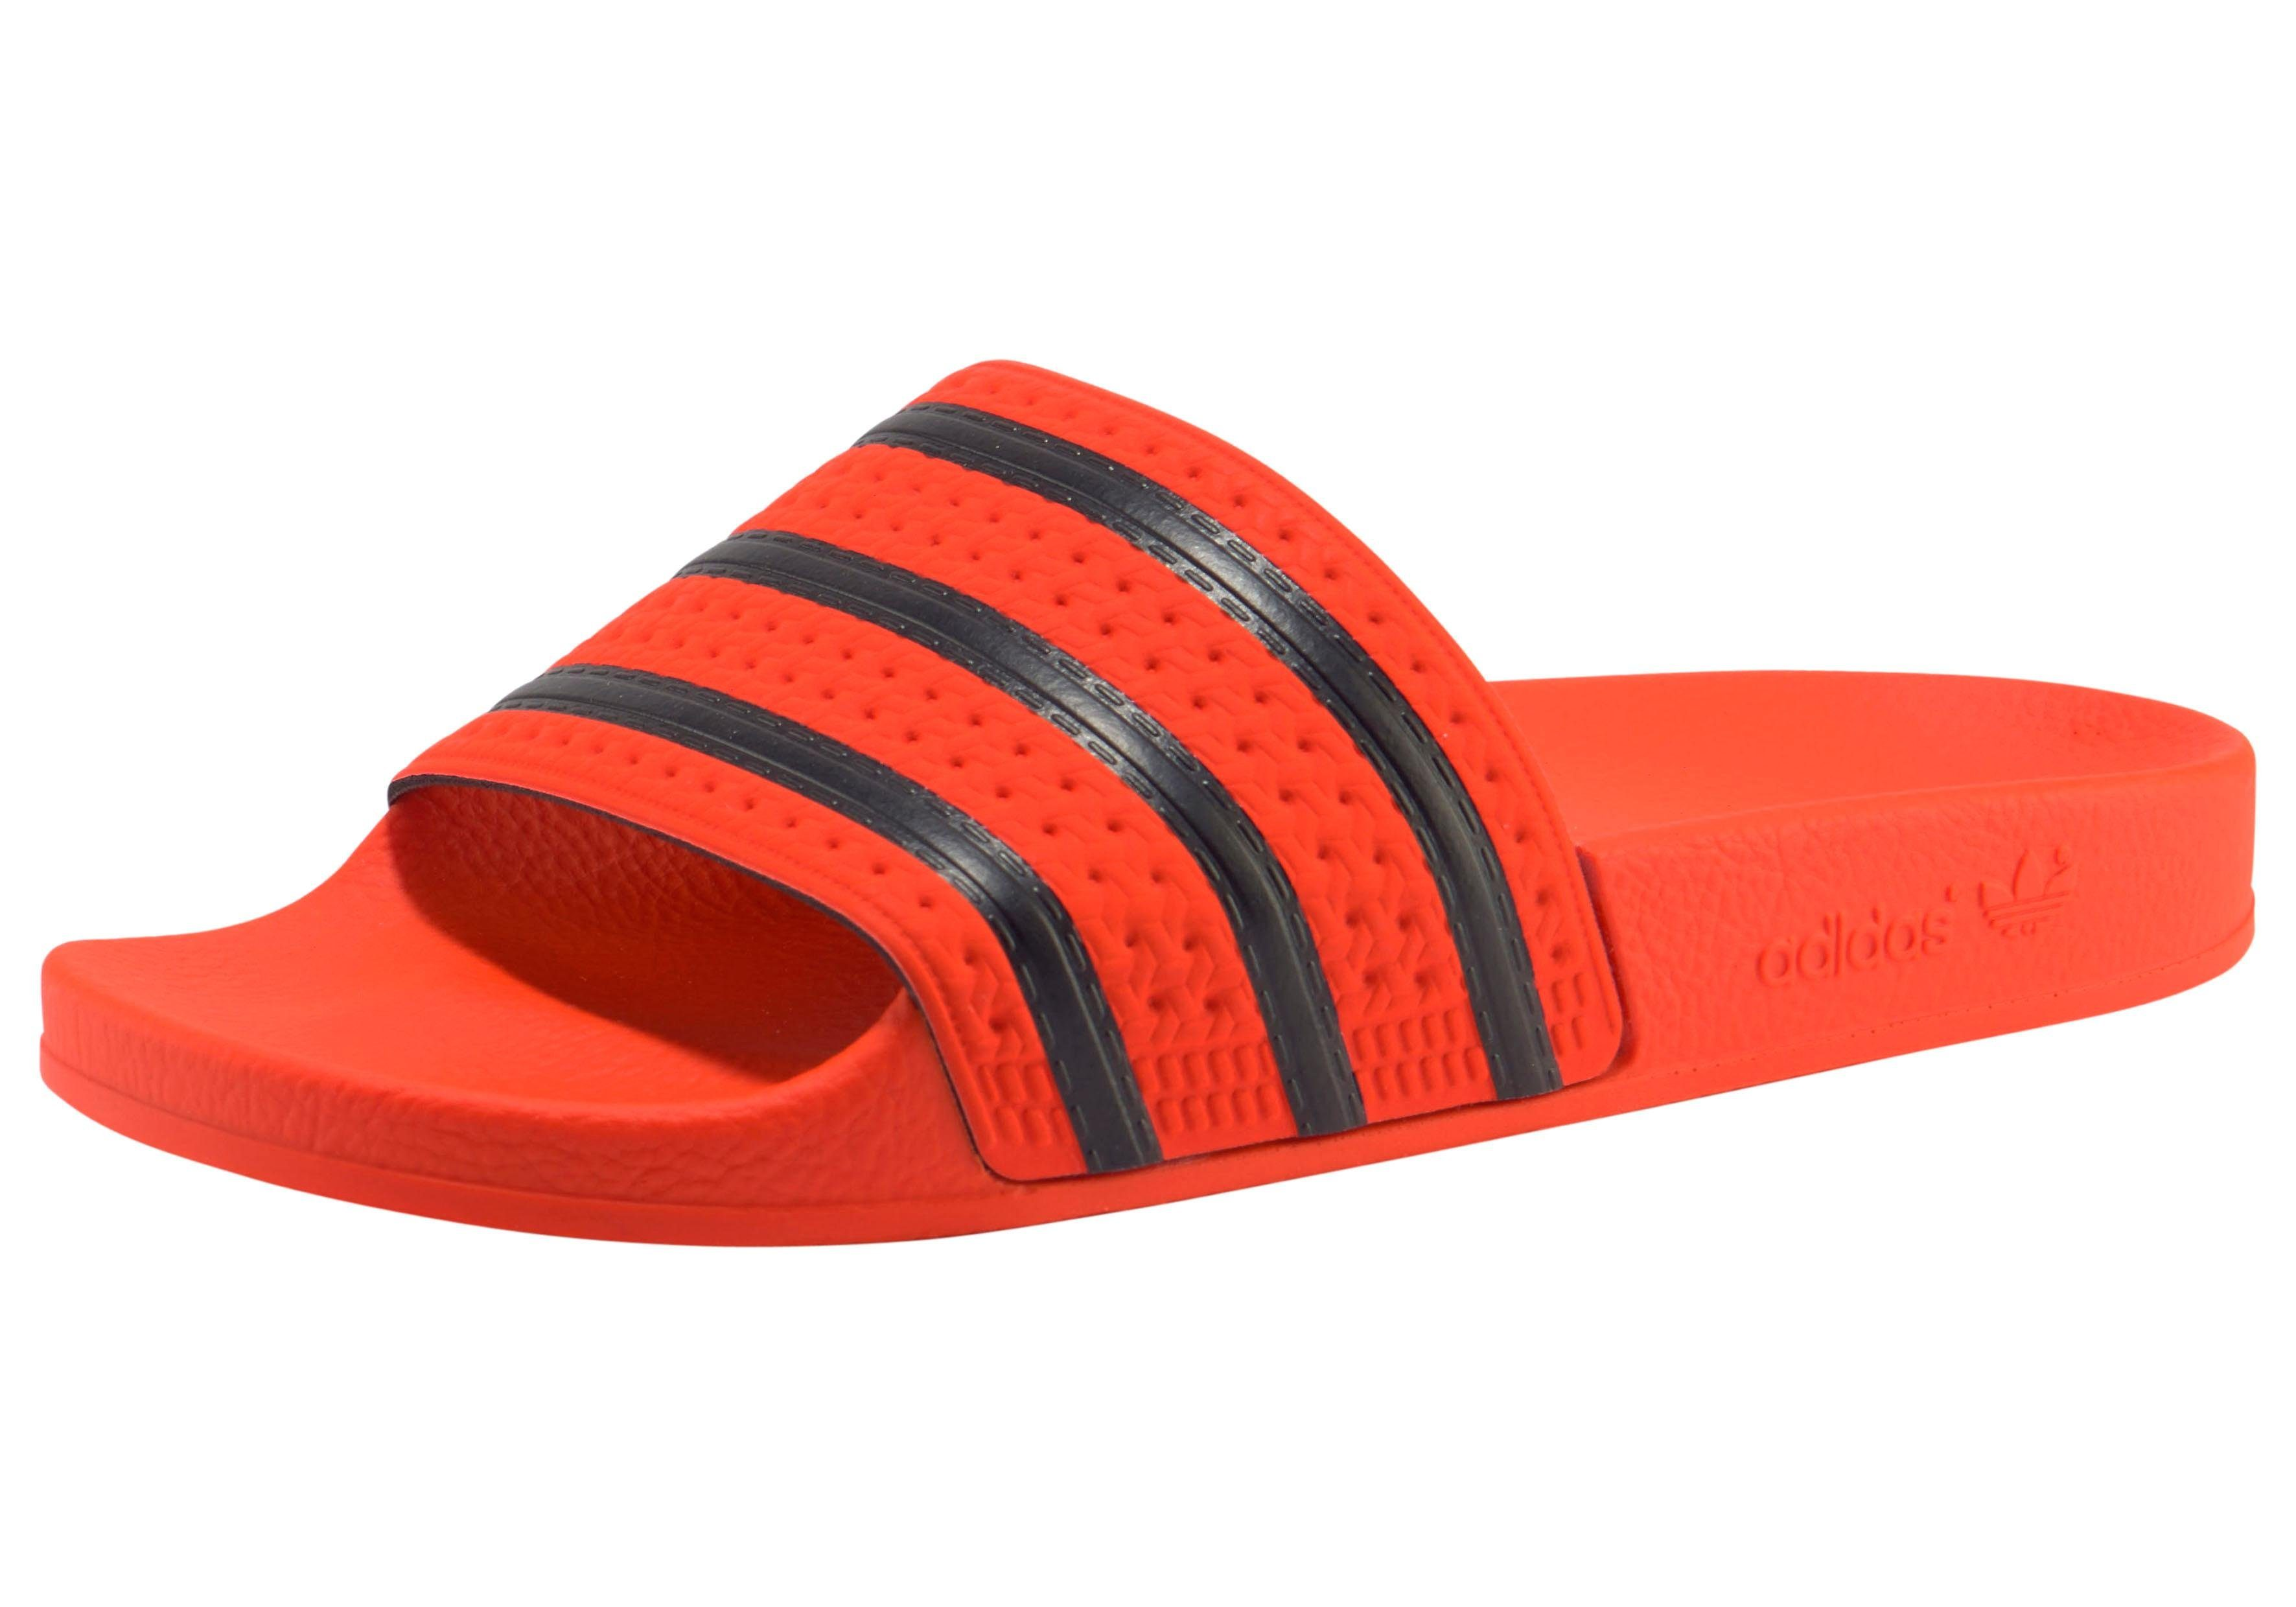 adidas Originals »Adilette« Badesandale, Strapazierfähiges Obermaterial aus Synthetik online kaufen | OTTO